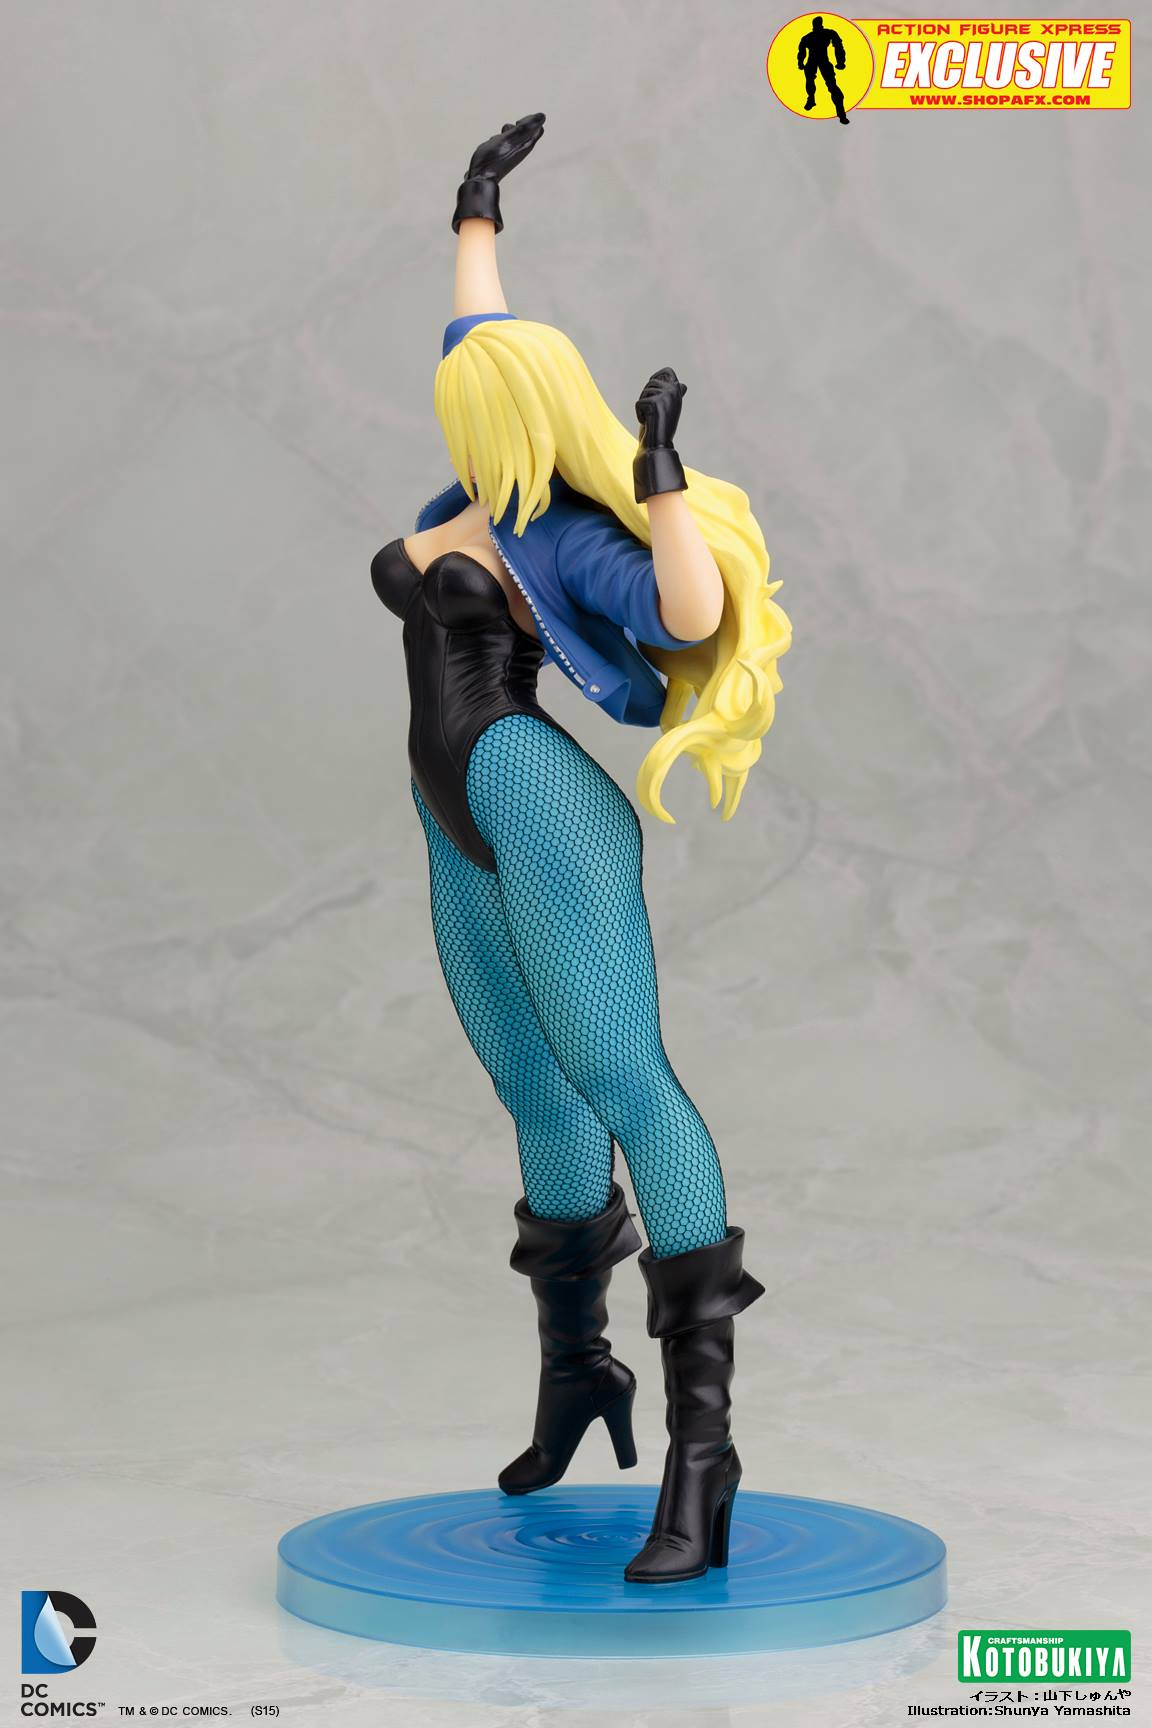 black-canary-classic-costume-bishoujo-statue-exclusive-dc-comics-kotobukiya-4